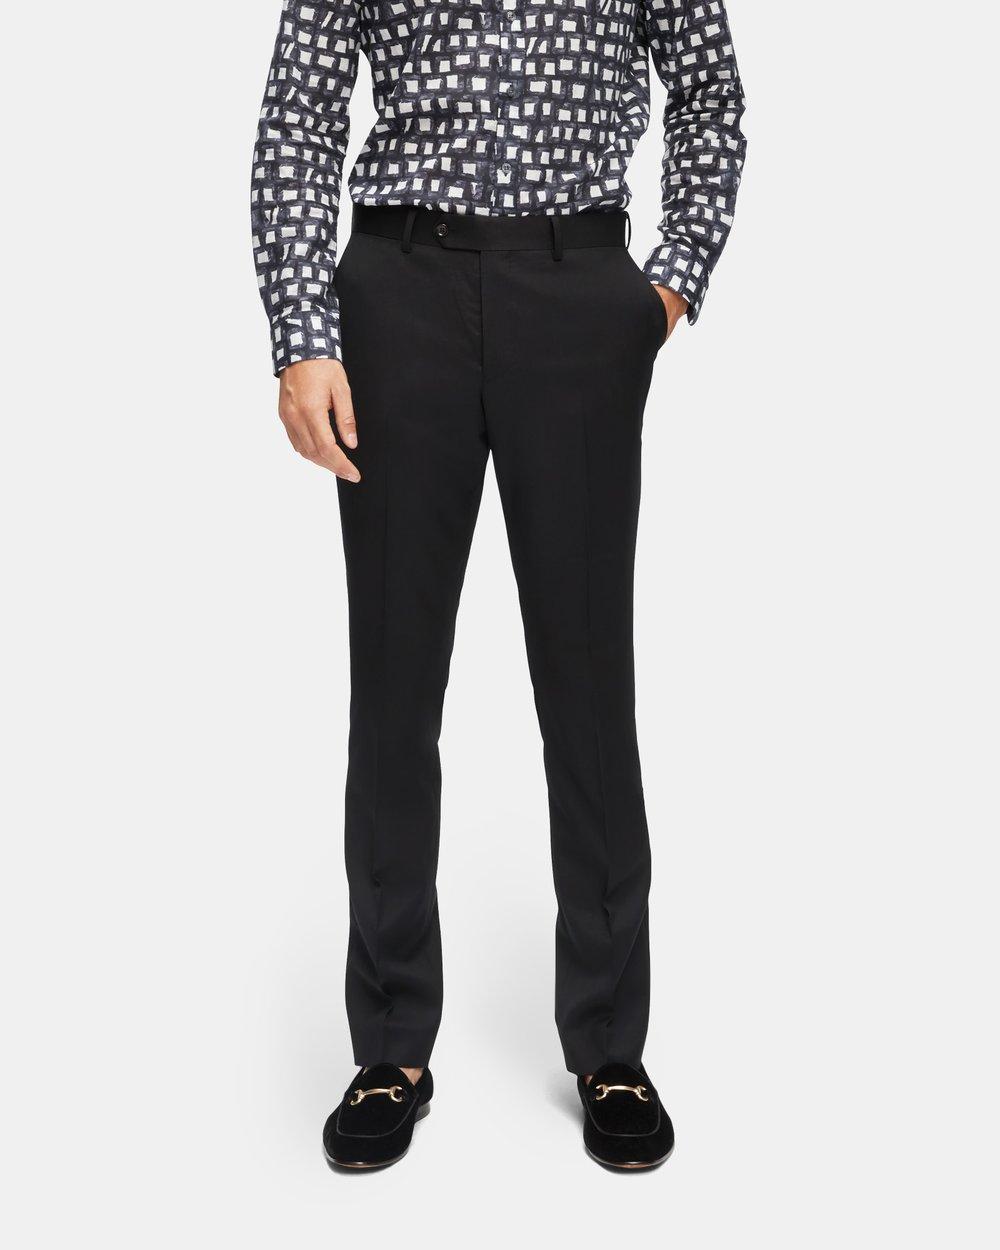 Houston Pants By Aquila Online The Iconic Australia